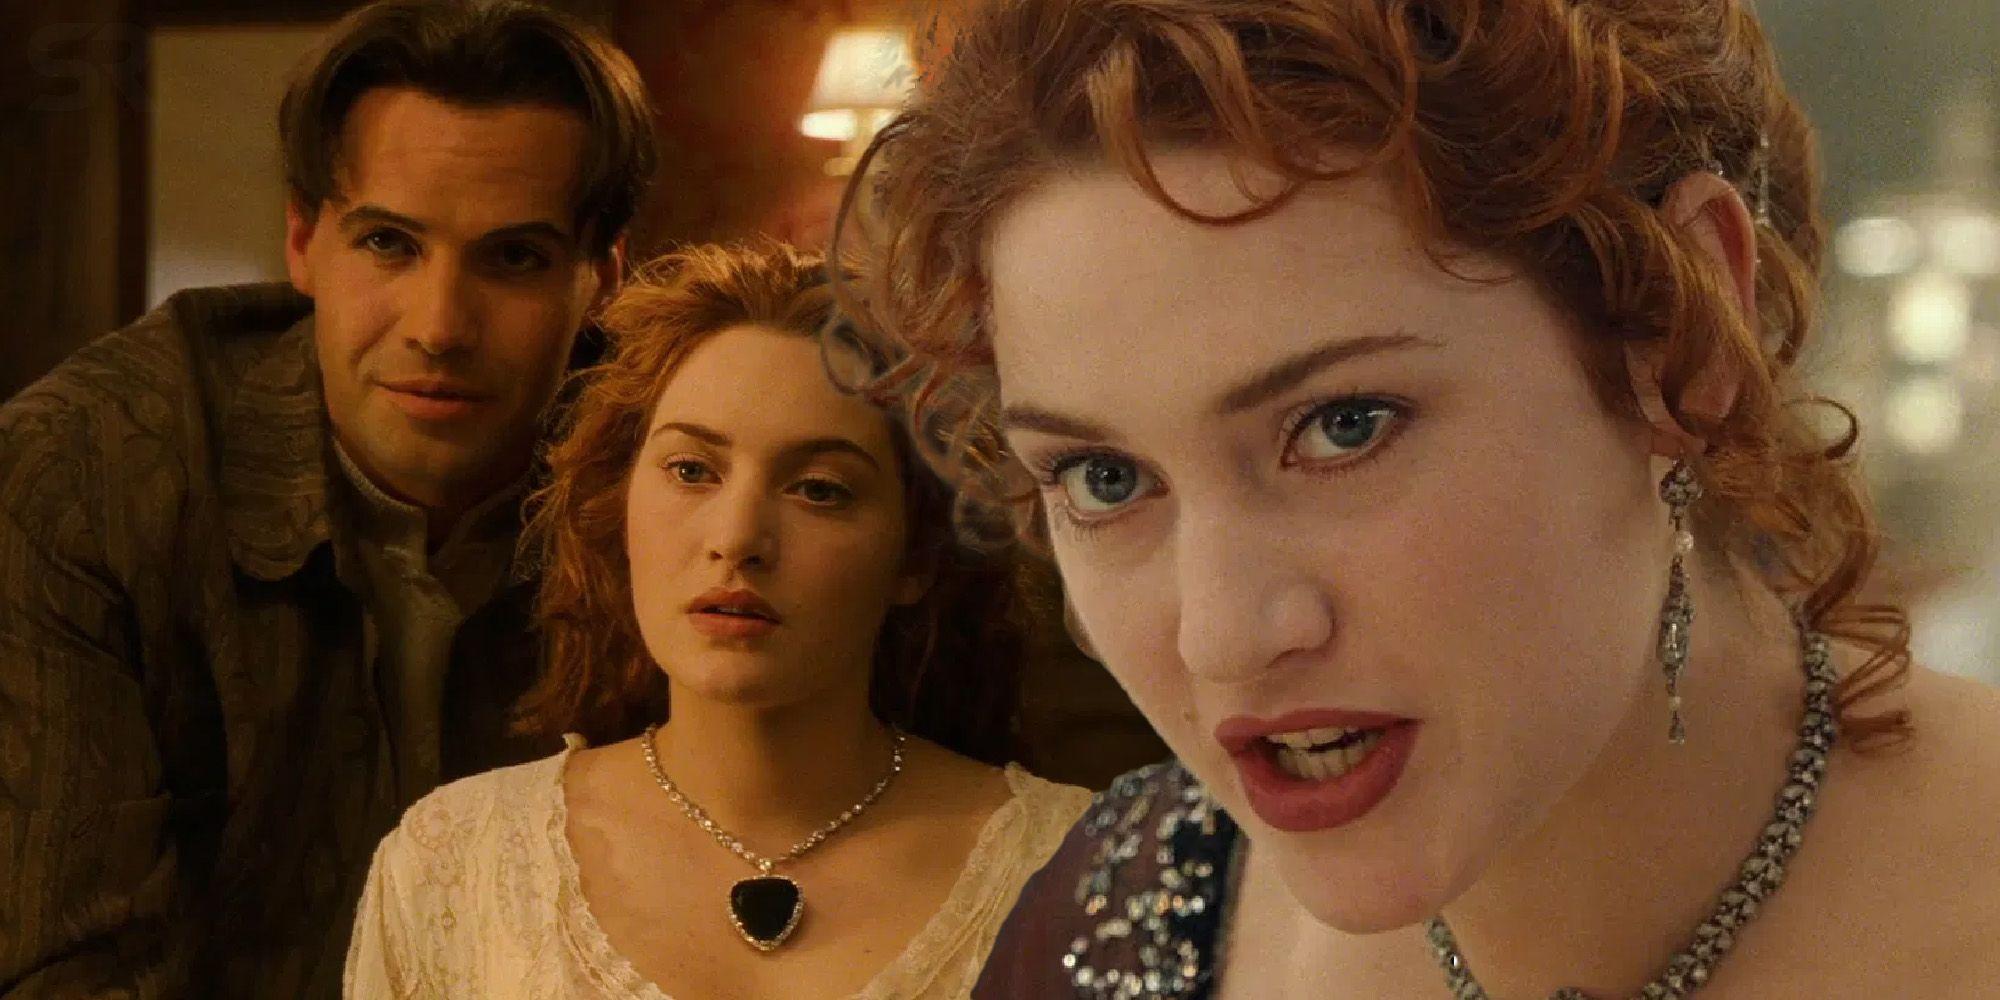 Titanic: Rose's Necklace Plot Hole Explained | Screen Rant